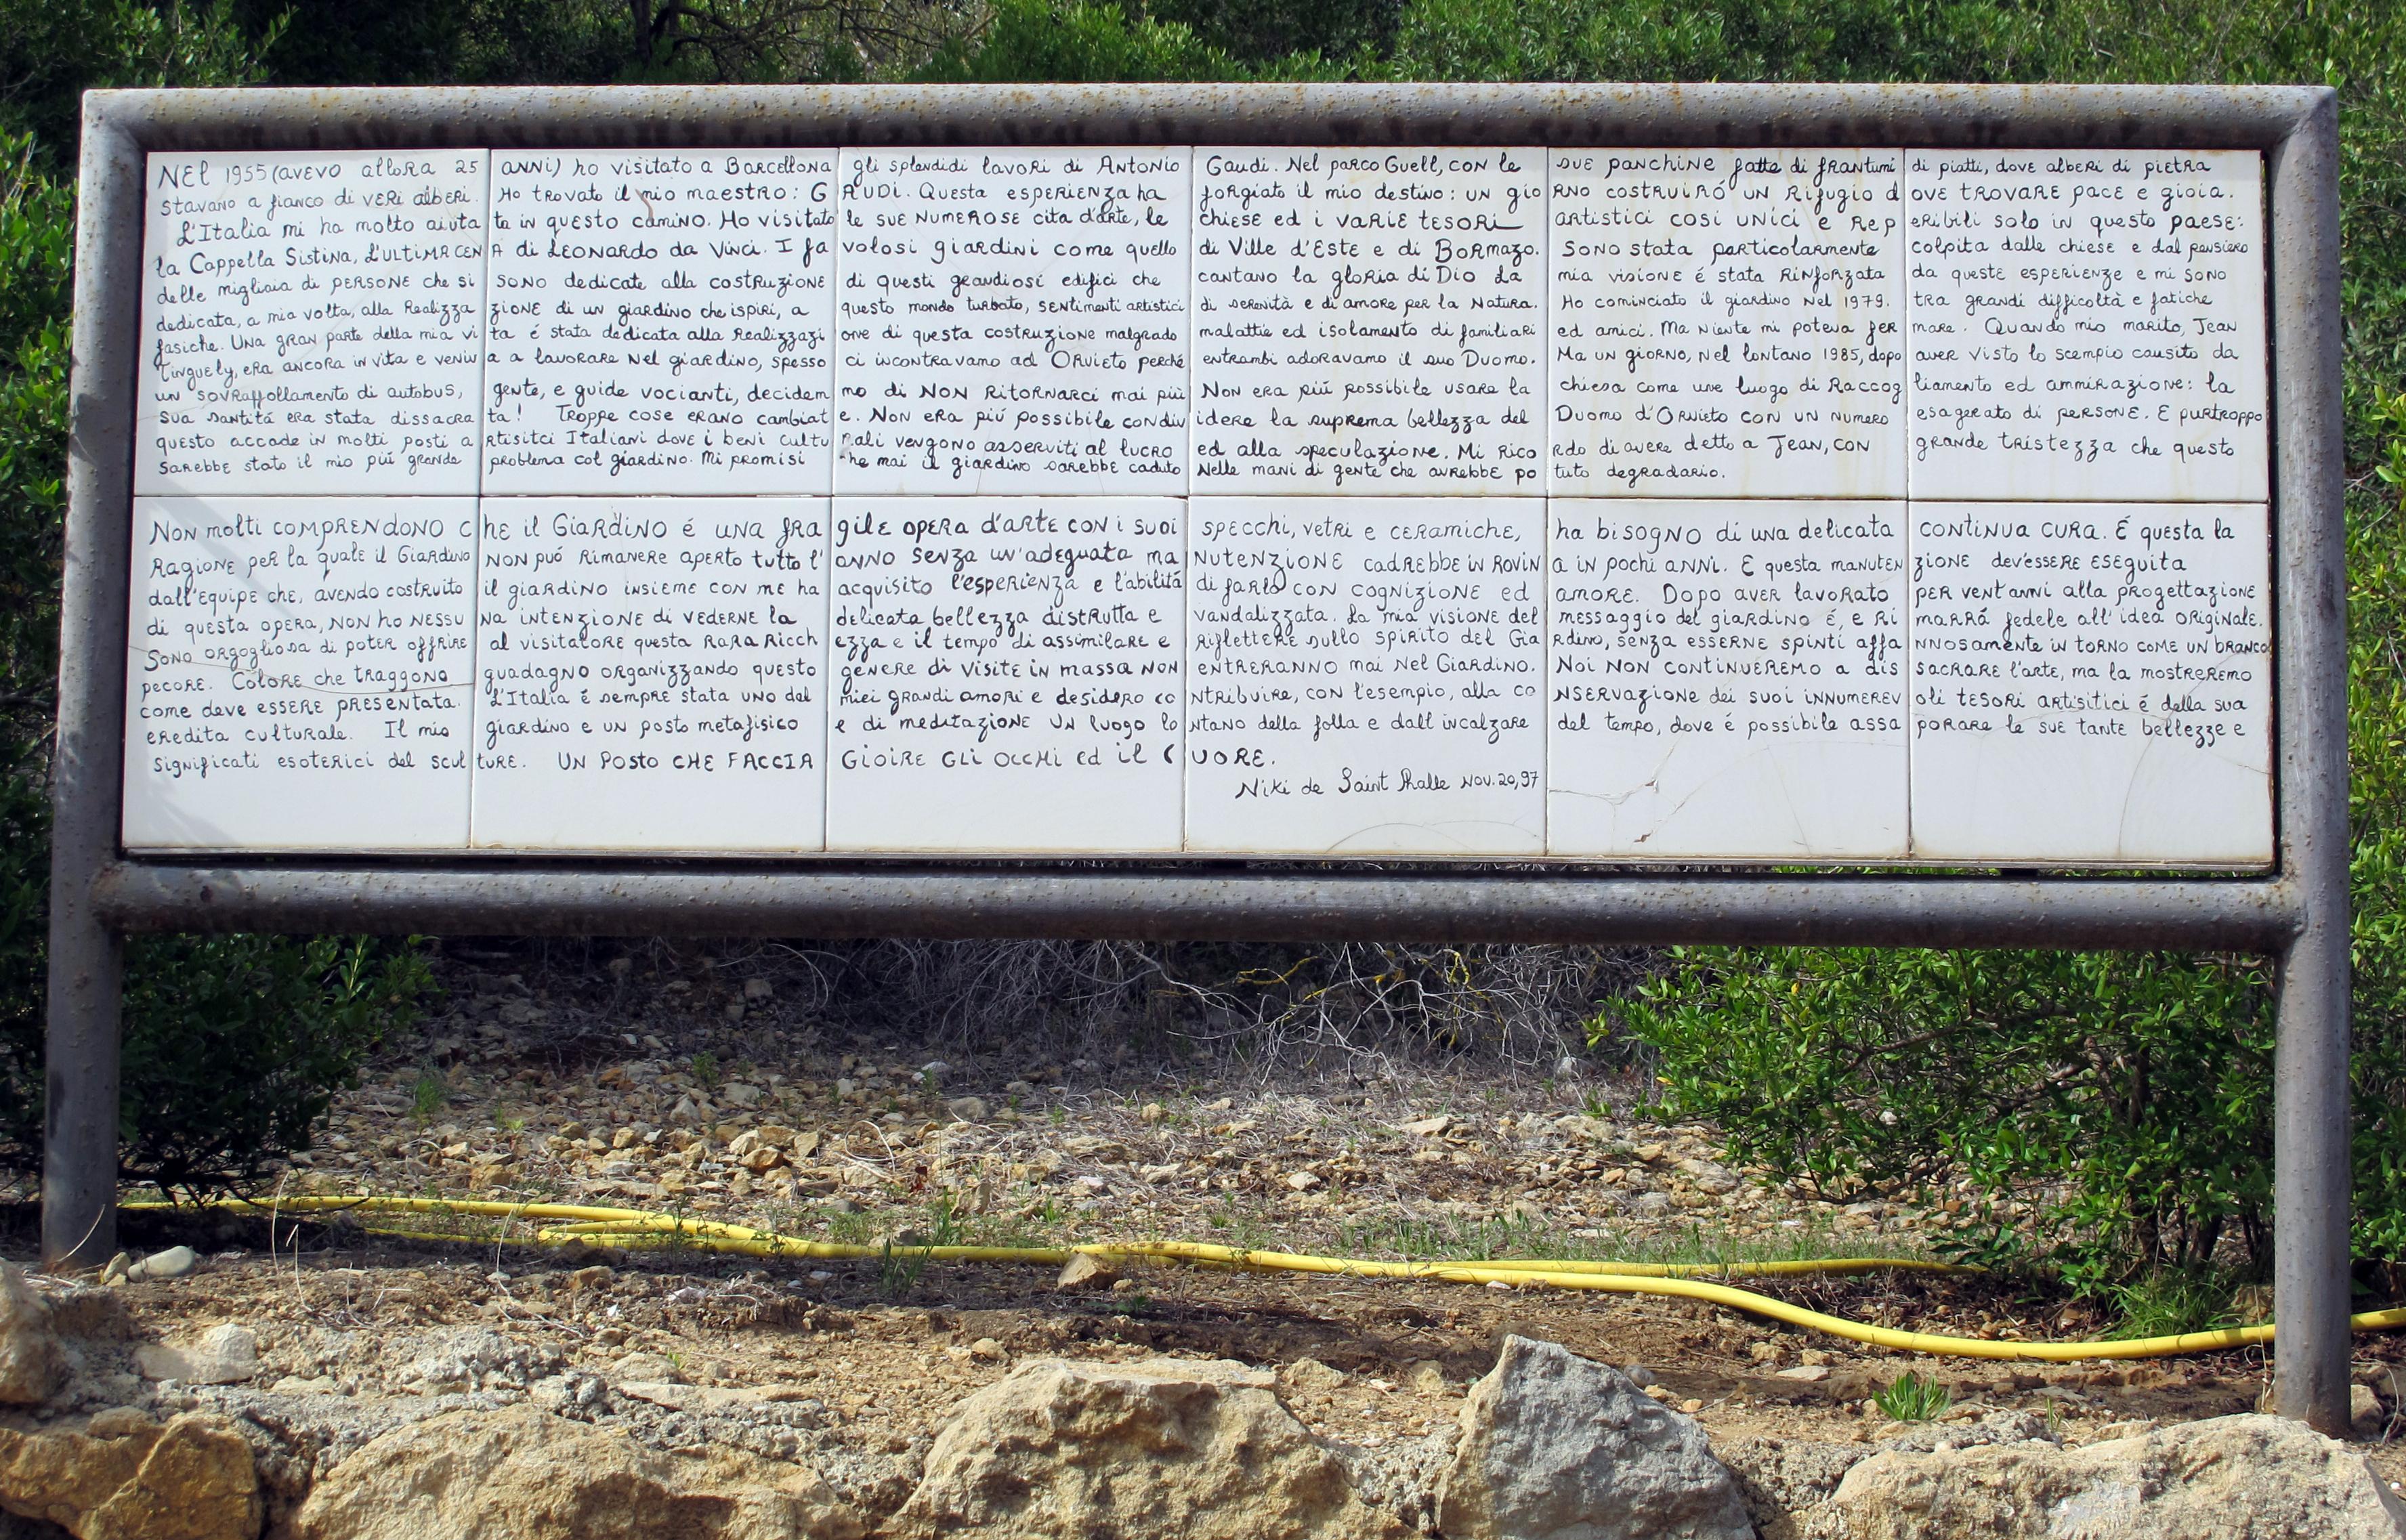 Niki de saint-phalle, giardino dei tarocchi, ingresso 01.JPG